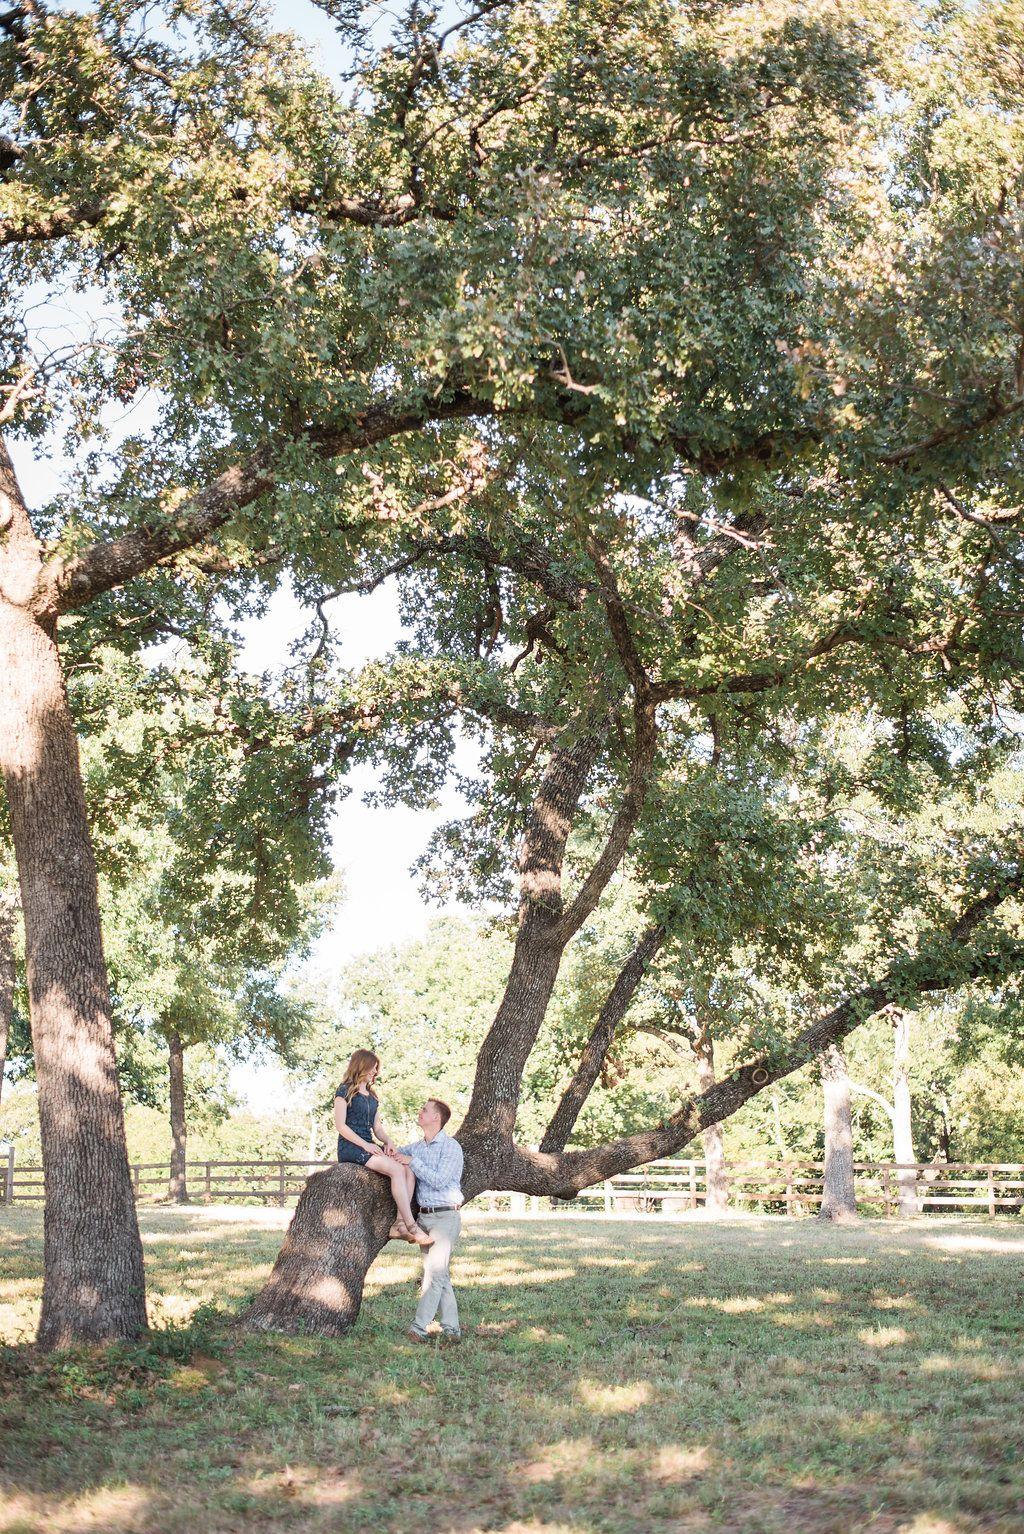 October engagement shoot at The Grove! Photos by Gray Door Photography www.thegroveaubreytexas.com #EngagementPictures #FallEngagement #TexasEngagement #NorthTexasWeddingVenue #TheGroveTX #OutdoorEngagement #EngagementPictureOutfits #Engaged